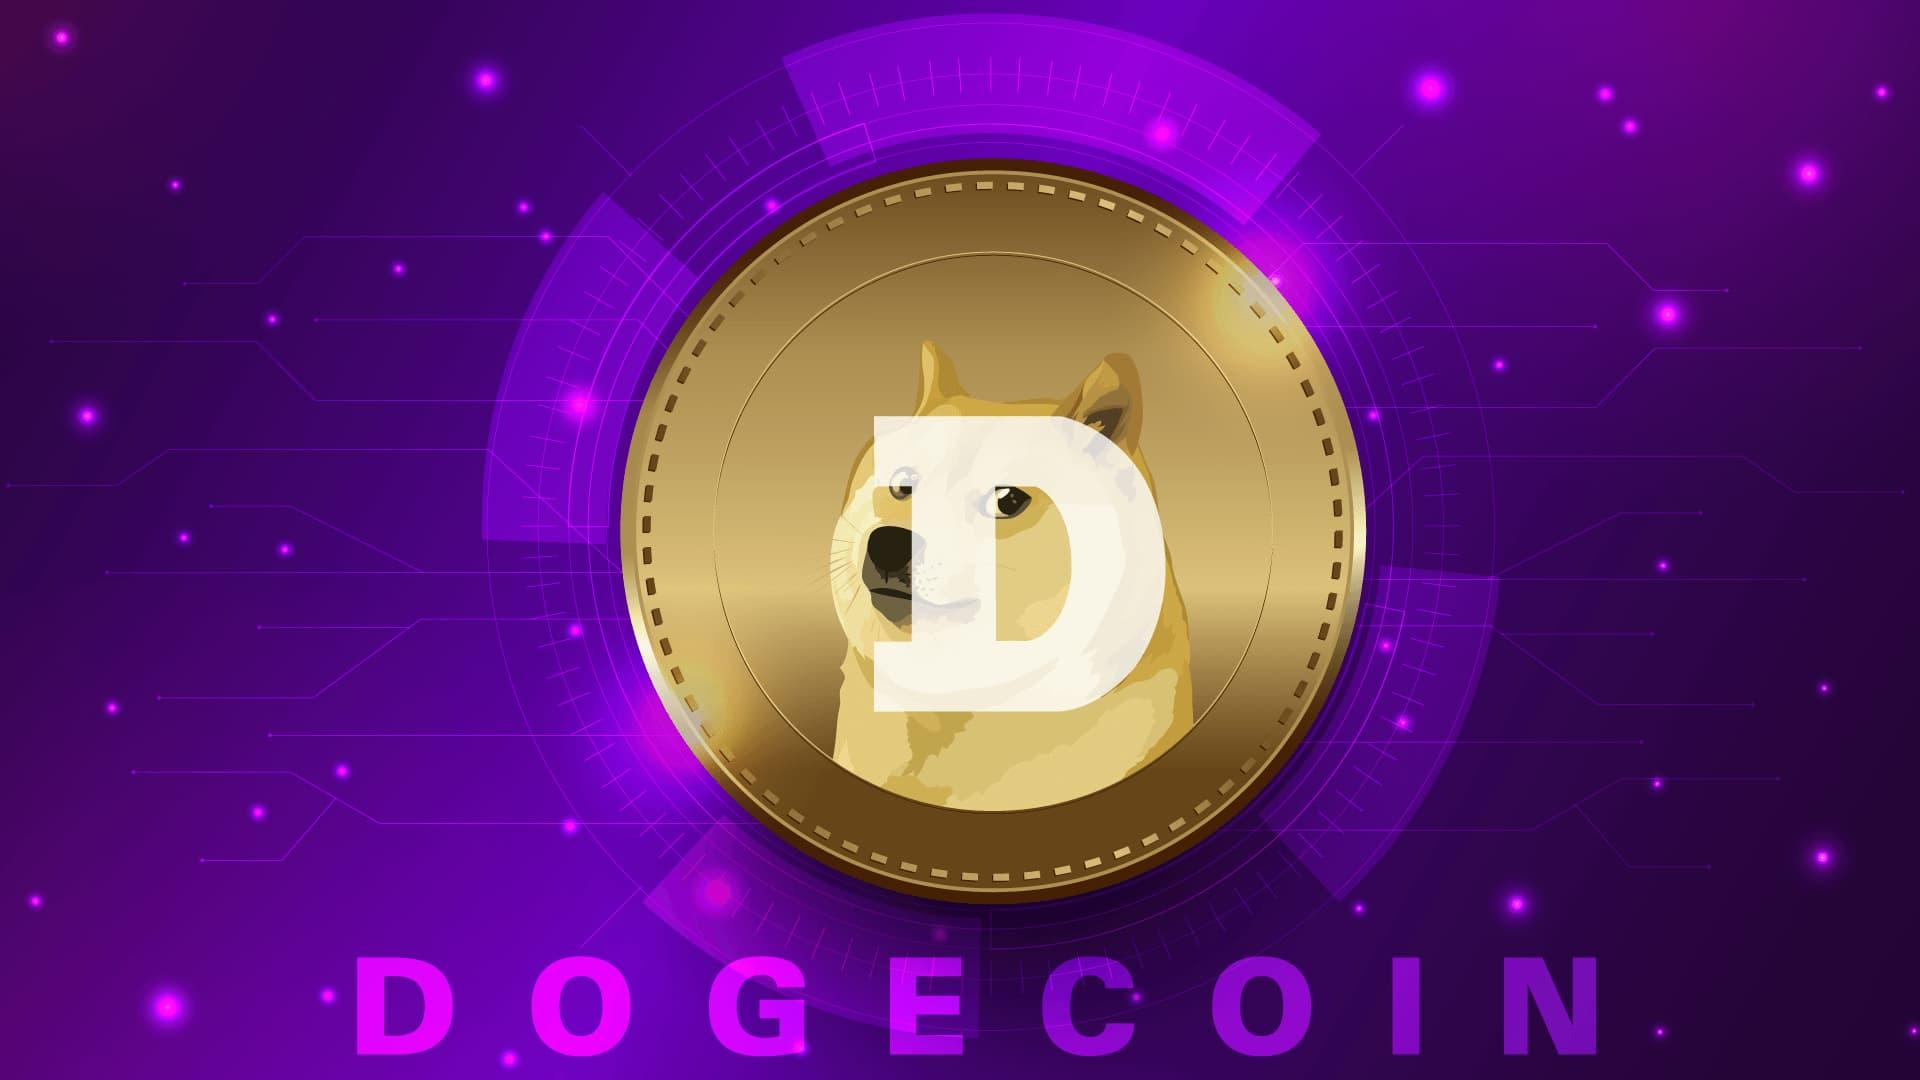 Dogecoin (DOGE) News